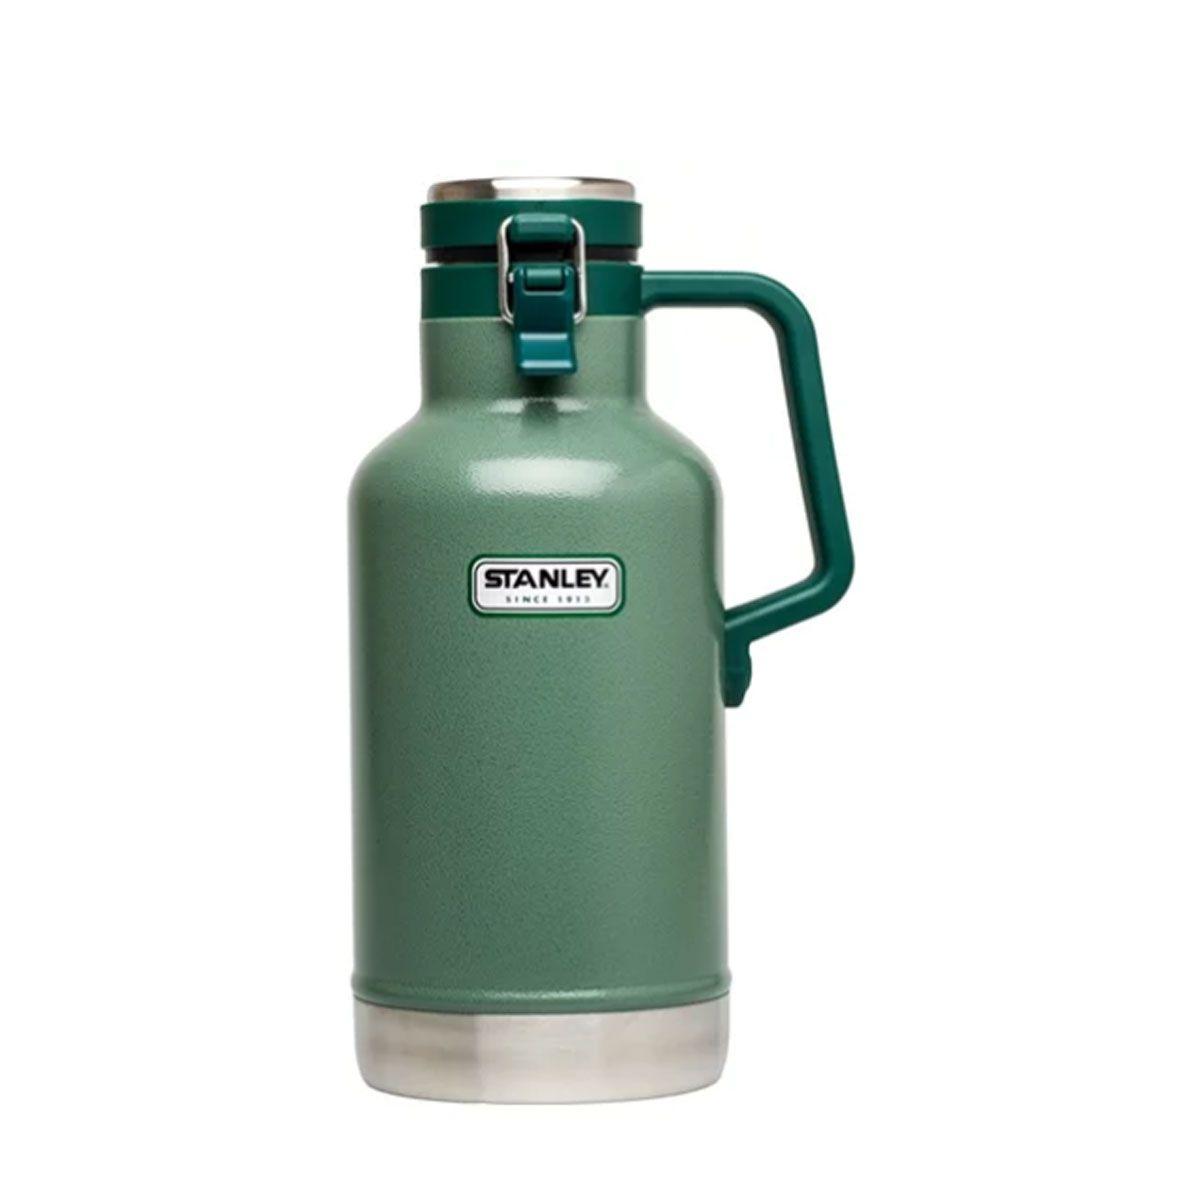 Garrafa Térmica Stanley Classic Vaccum Growler 1,9LT